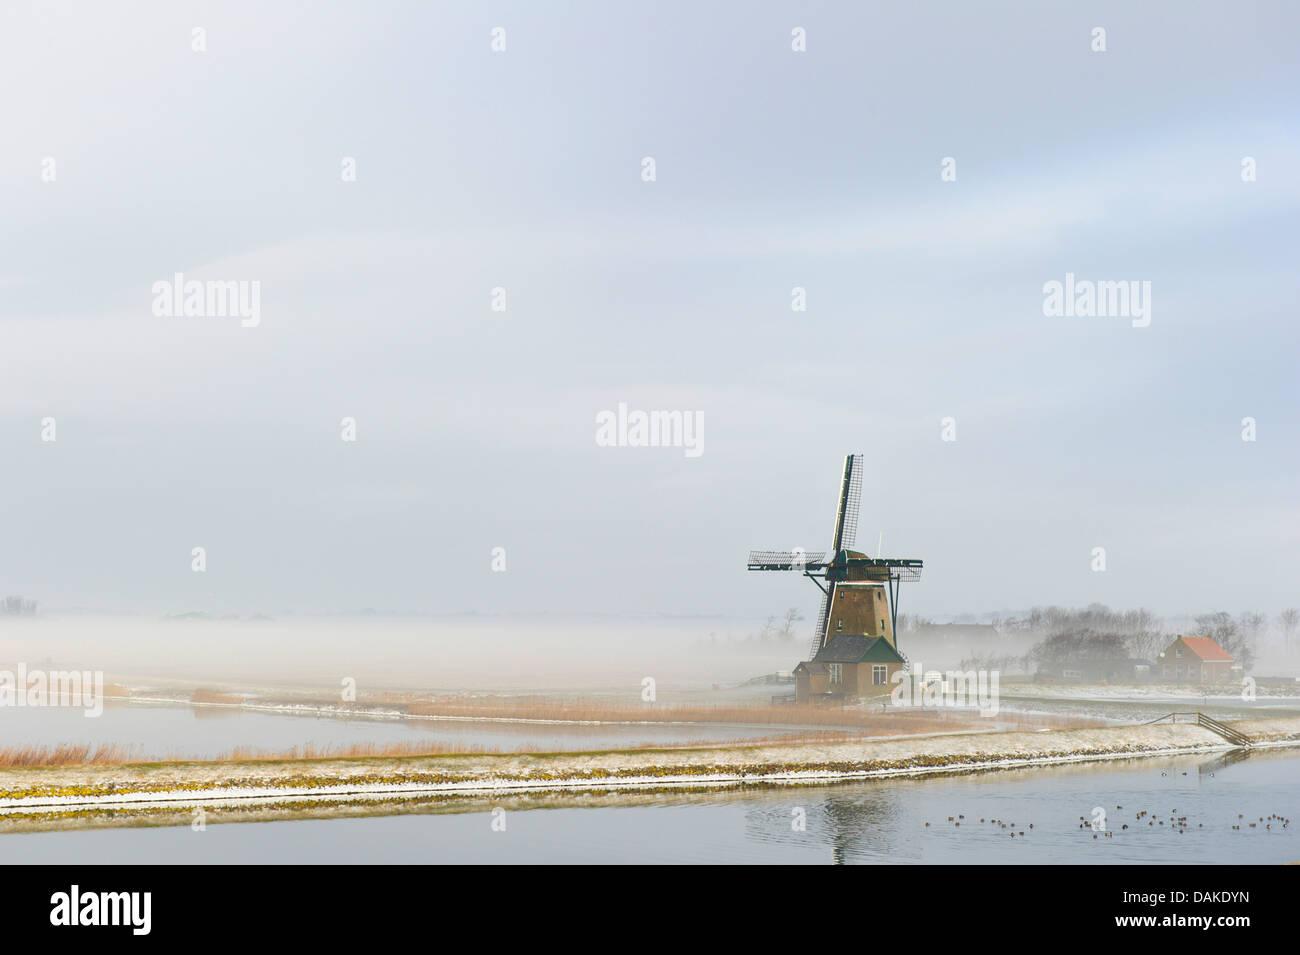 Dutch Windmills In North Sea Stock Photos Amp Dutch